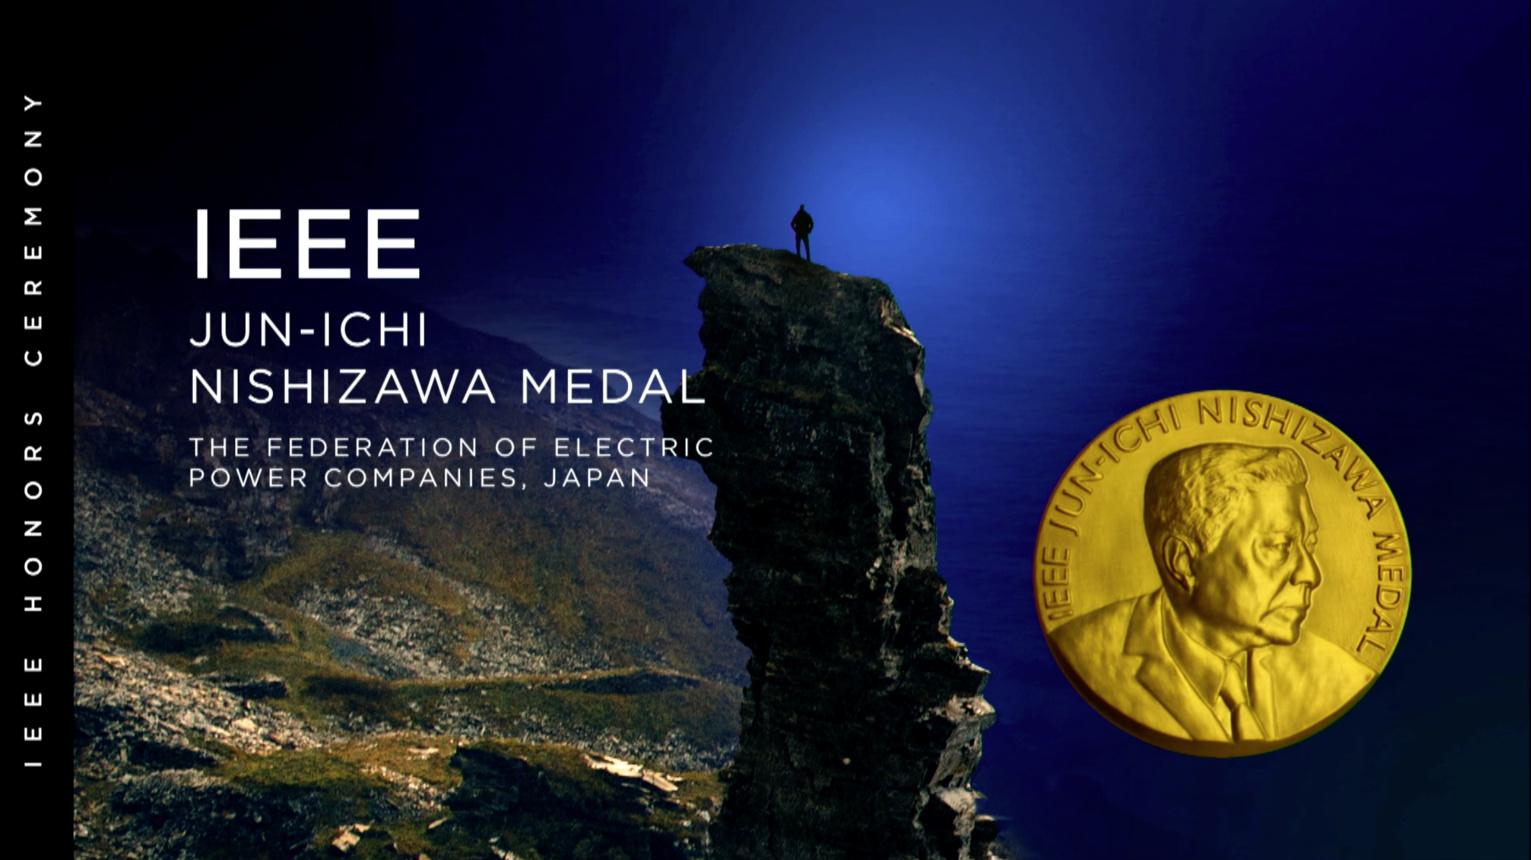 IEEE Jun-Ichi Nishizawa Medal - Joe C. Campbell - 2018 IEEE Honors Ceremony